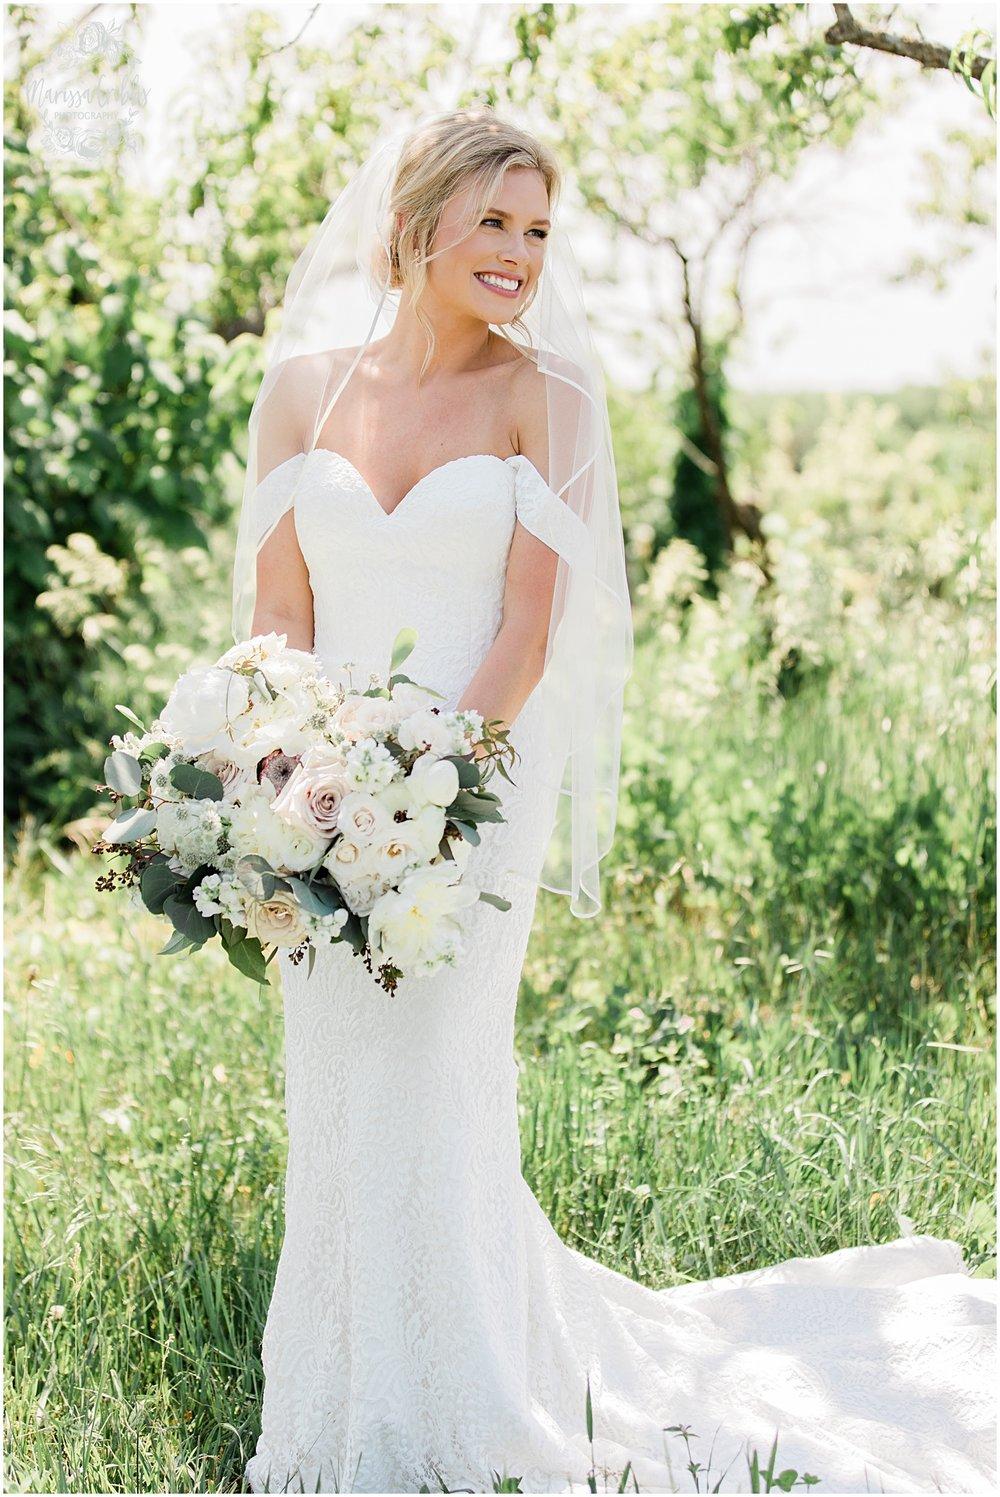 RHODES WEDDING | WESTON RED BARN FARM | MARISSA CRIBBS PHOTOGRAPHY_5236.jpg